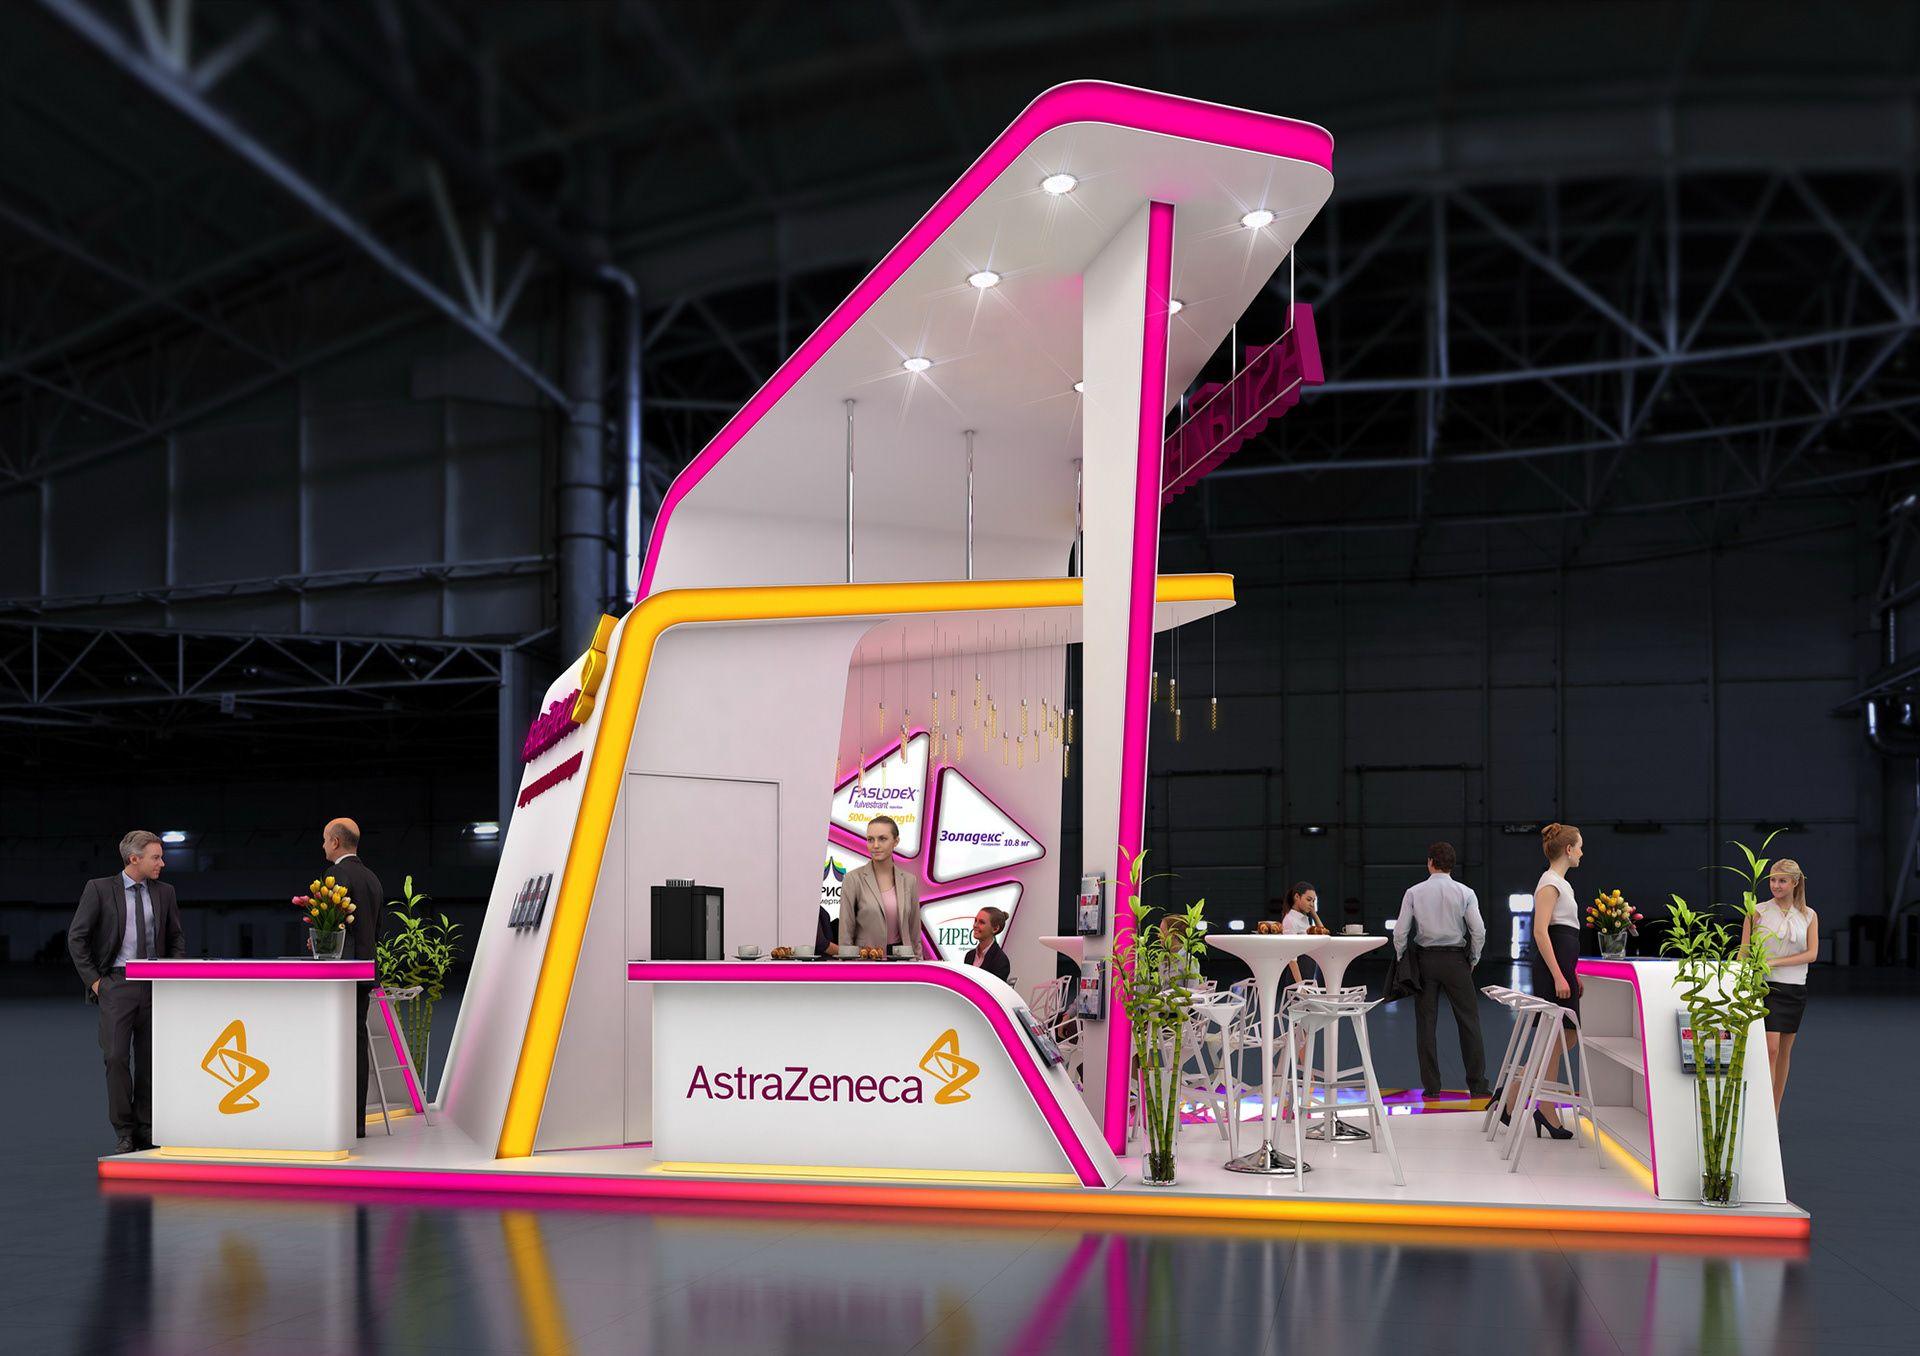 Astrazeneca Exhibition Stand On Behance In 2020 Exhibition Stand Exhibition Exhibition Design